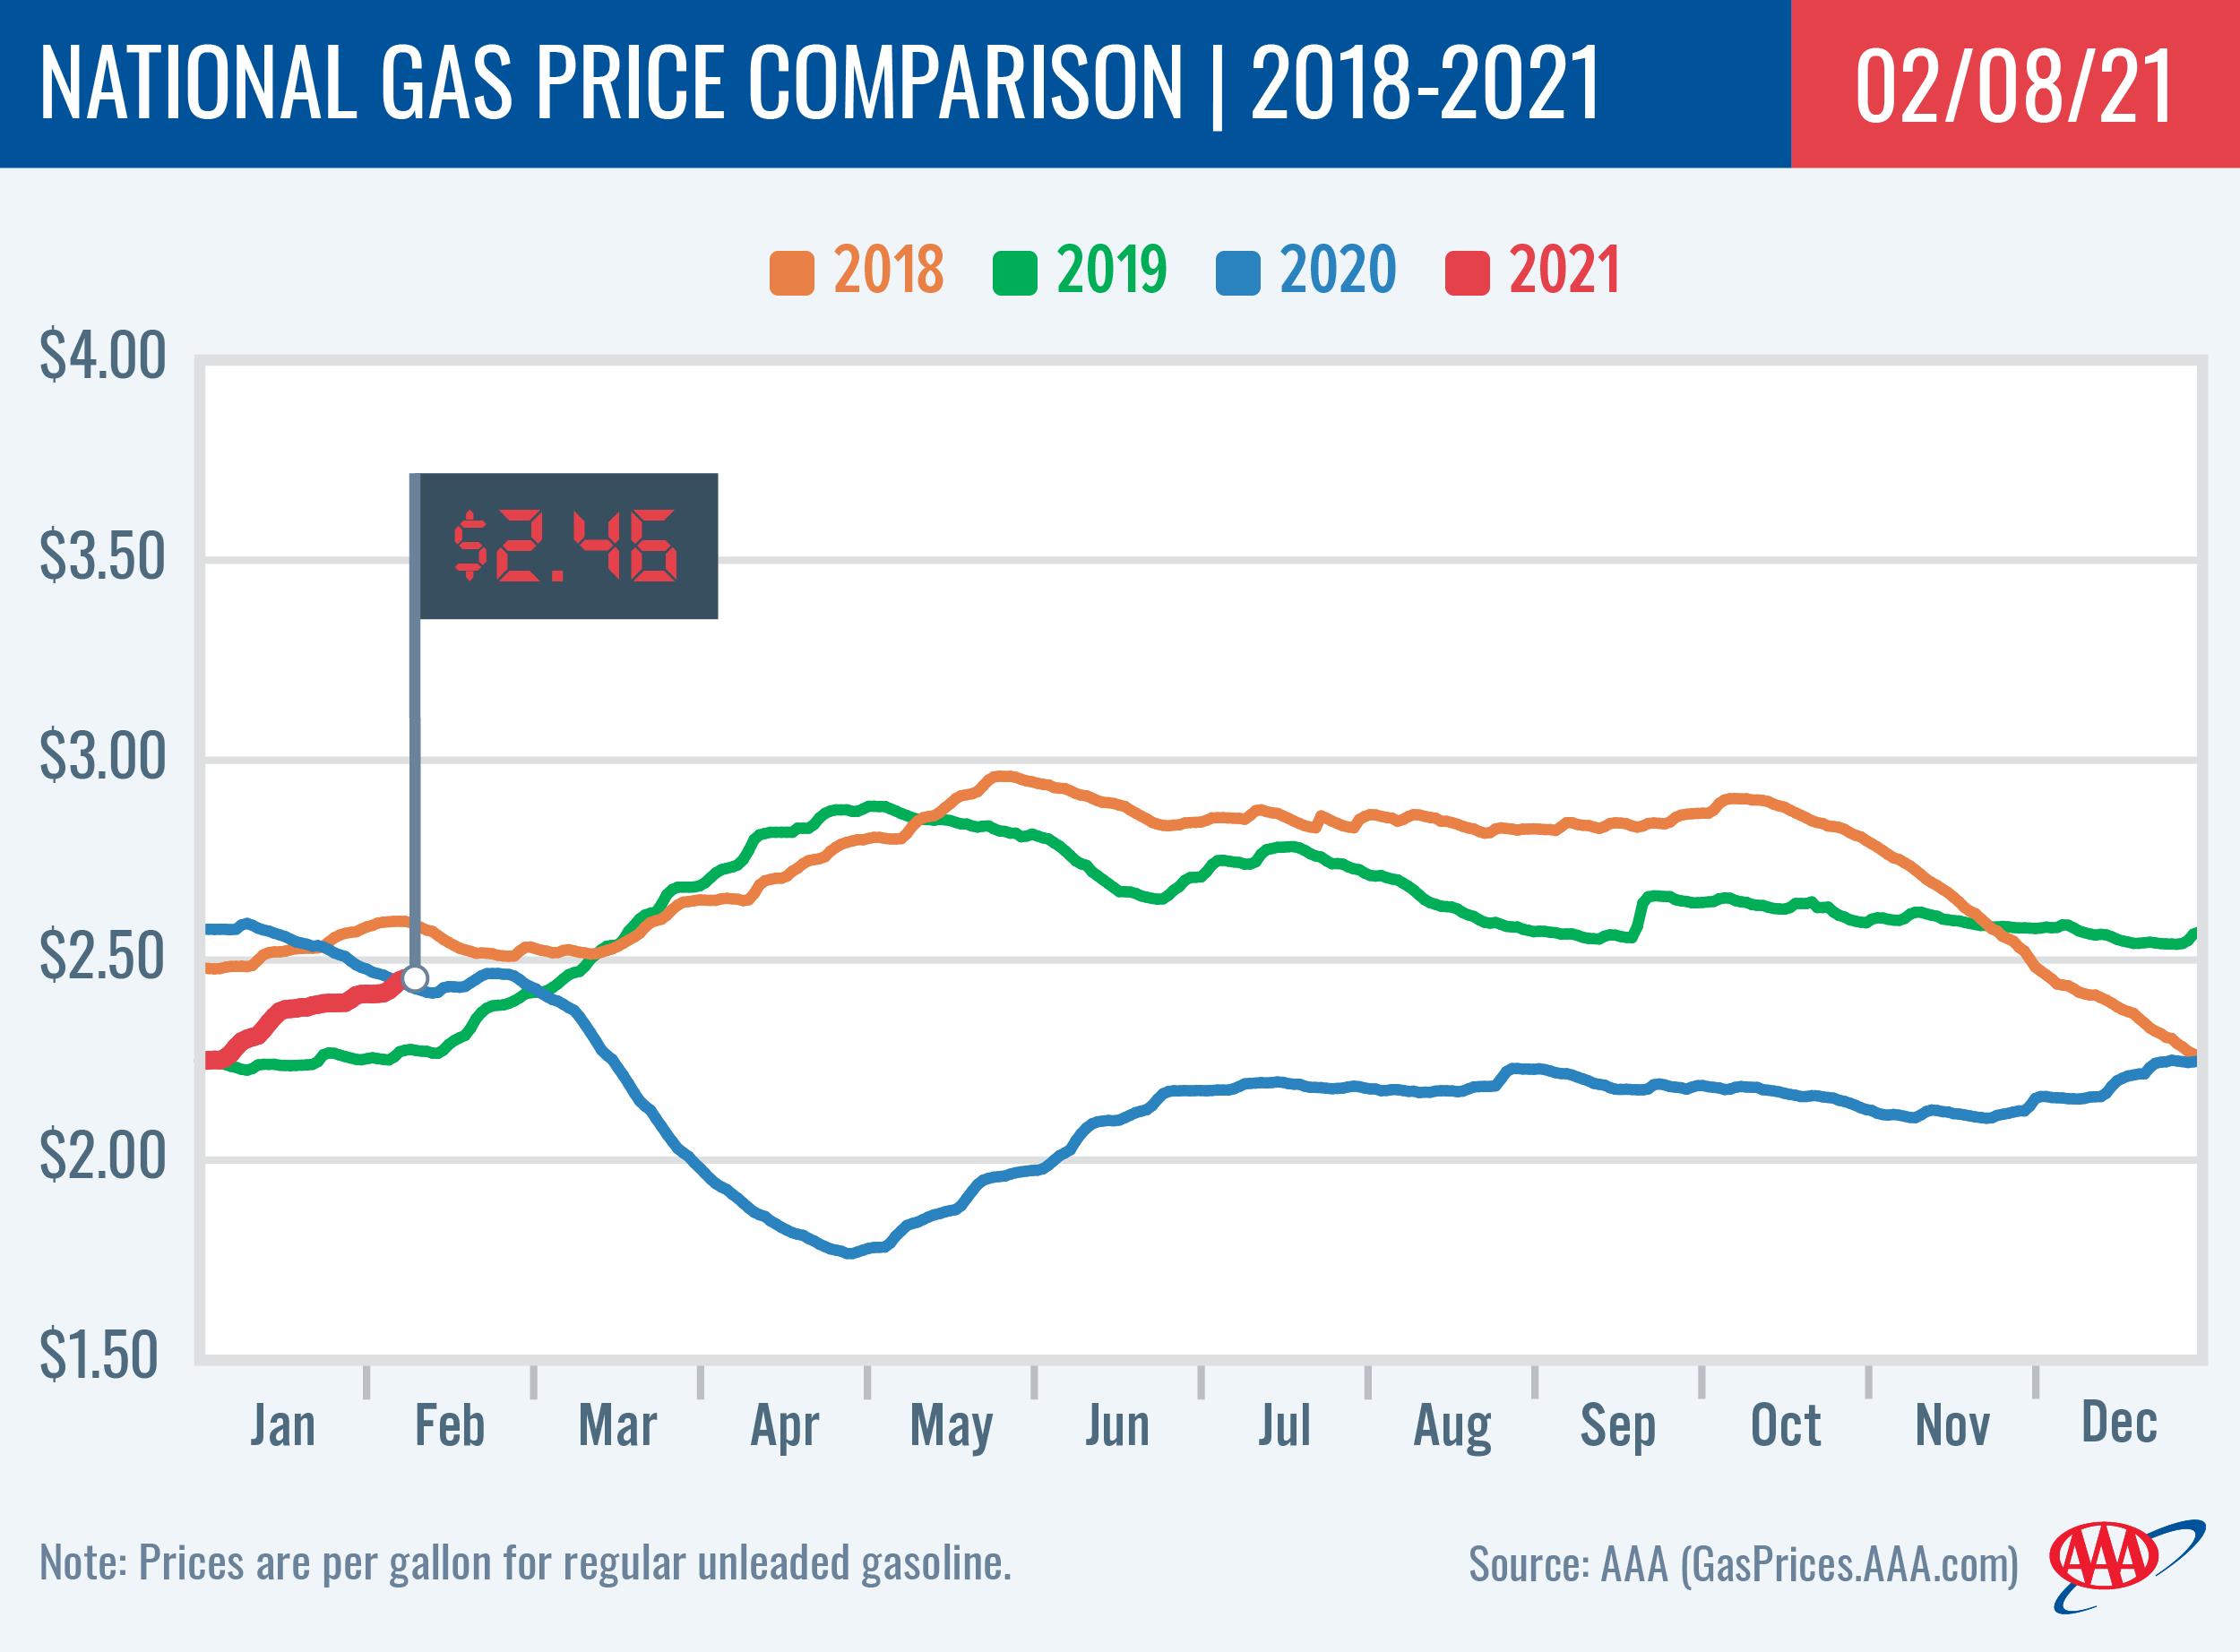 National Gas Price Comparison 2-8-2021